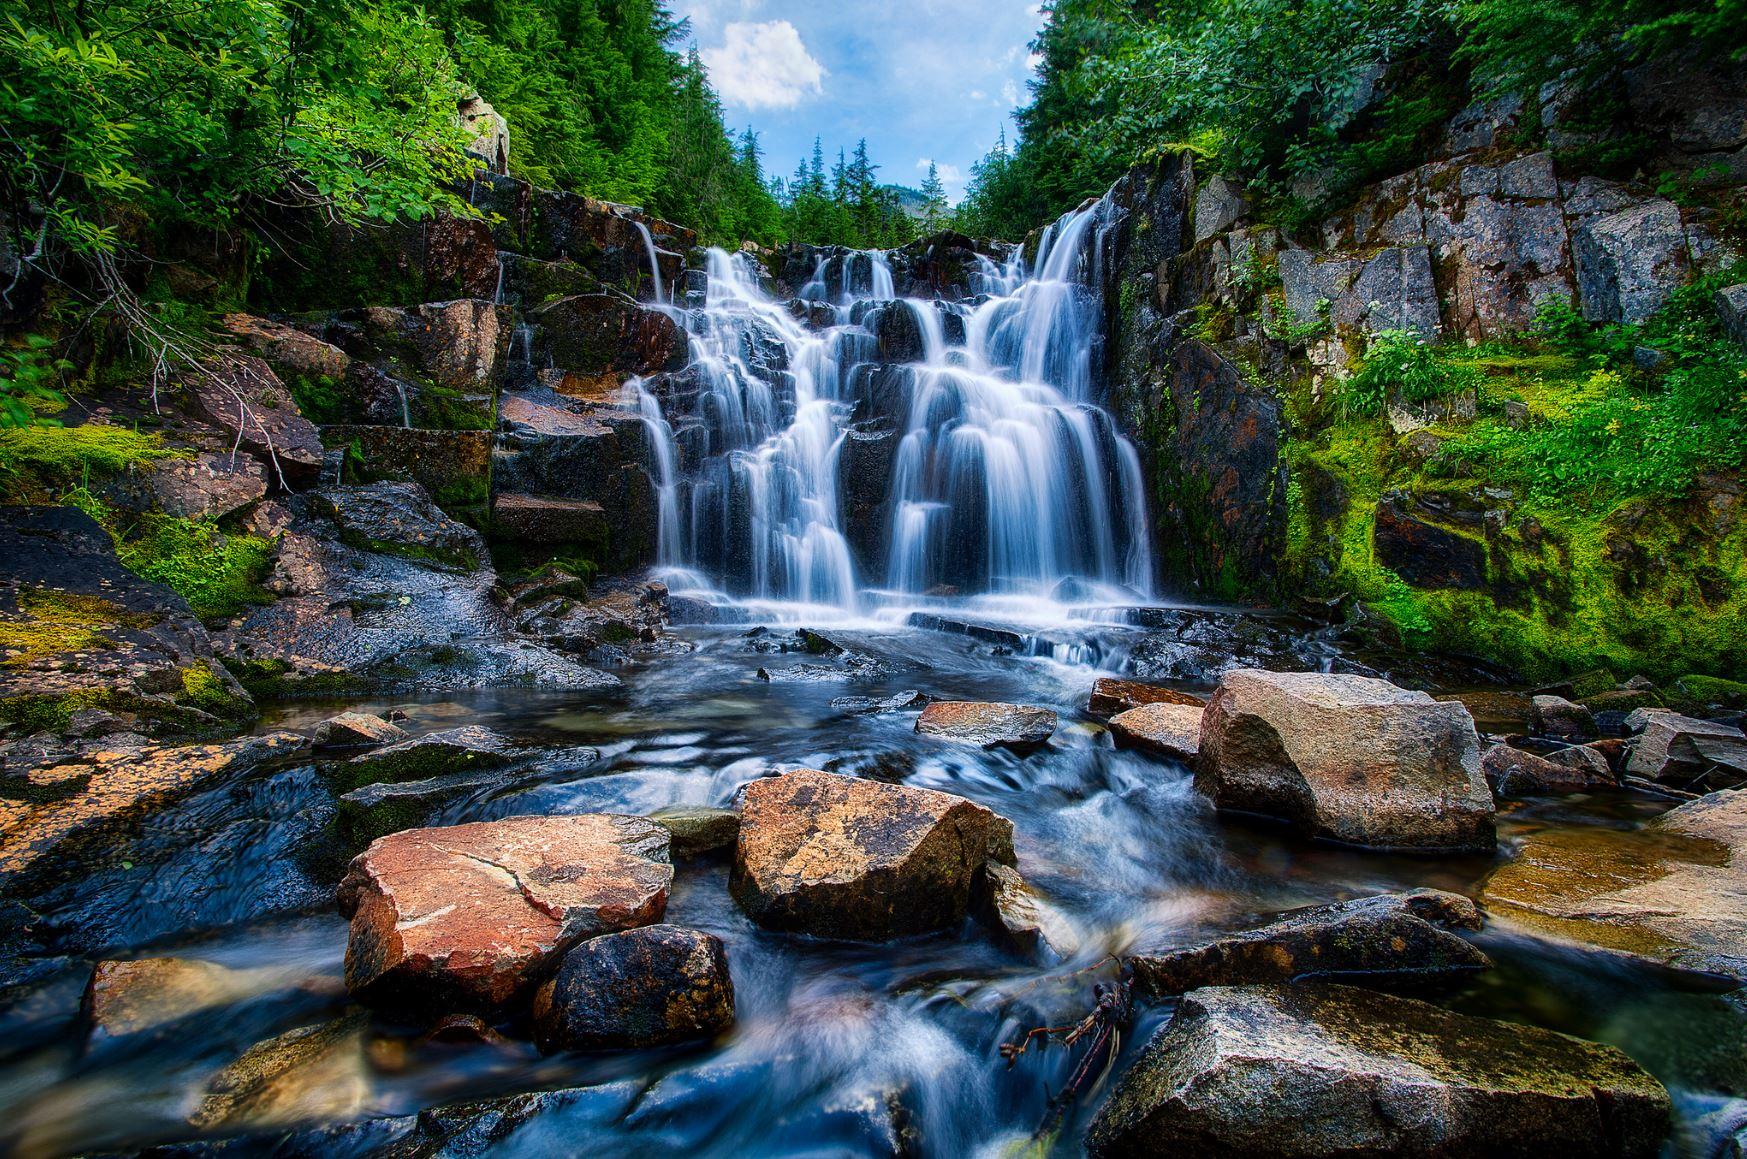 Mt-Ranier-National-Park-by-Michael-Matti